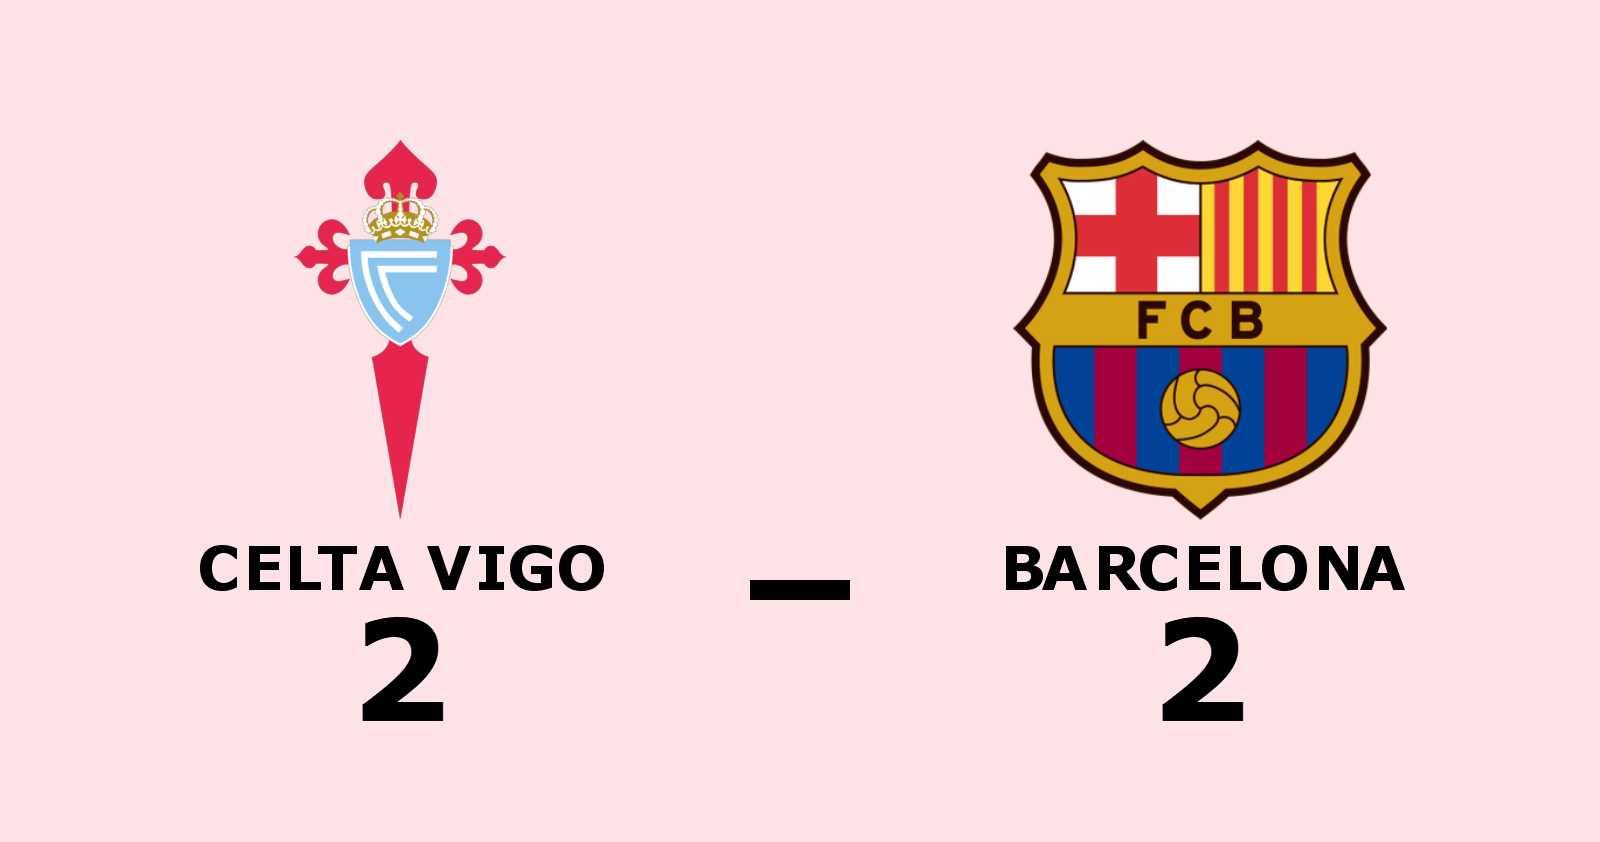 Celta Vigo kryssade mot Barcelona